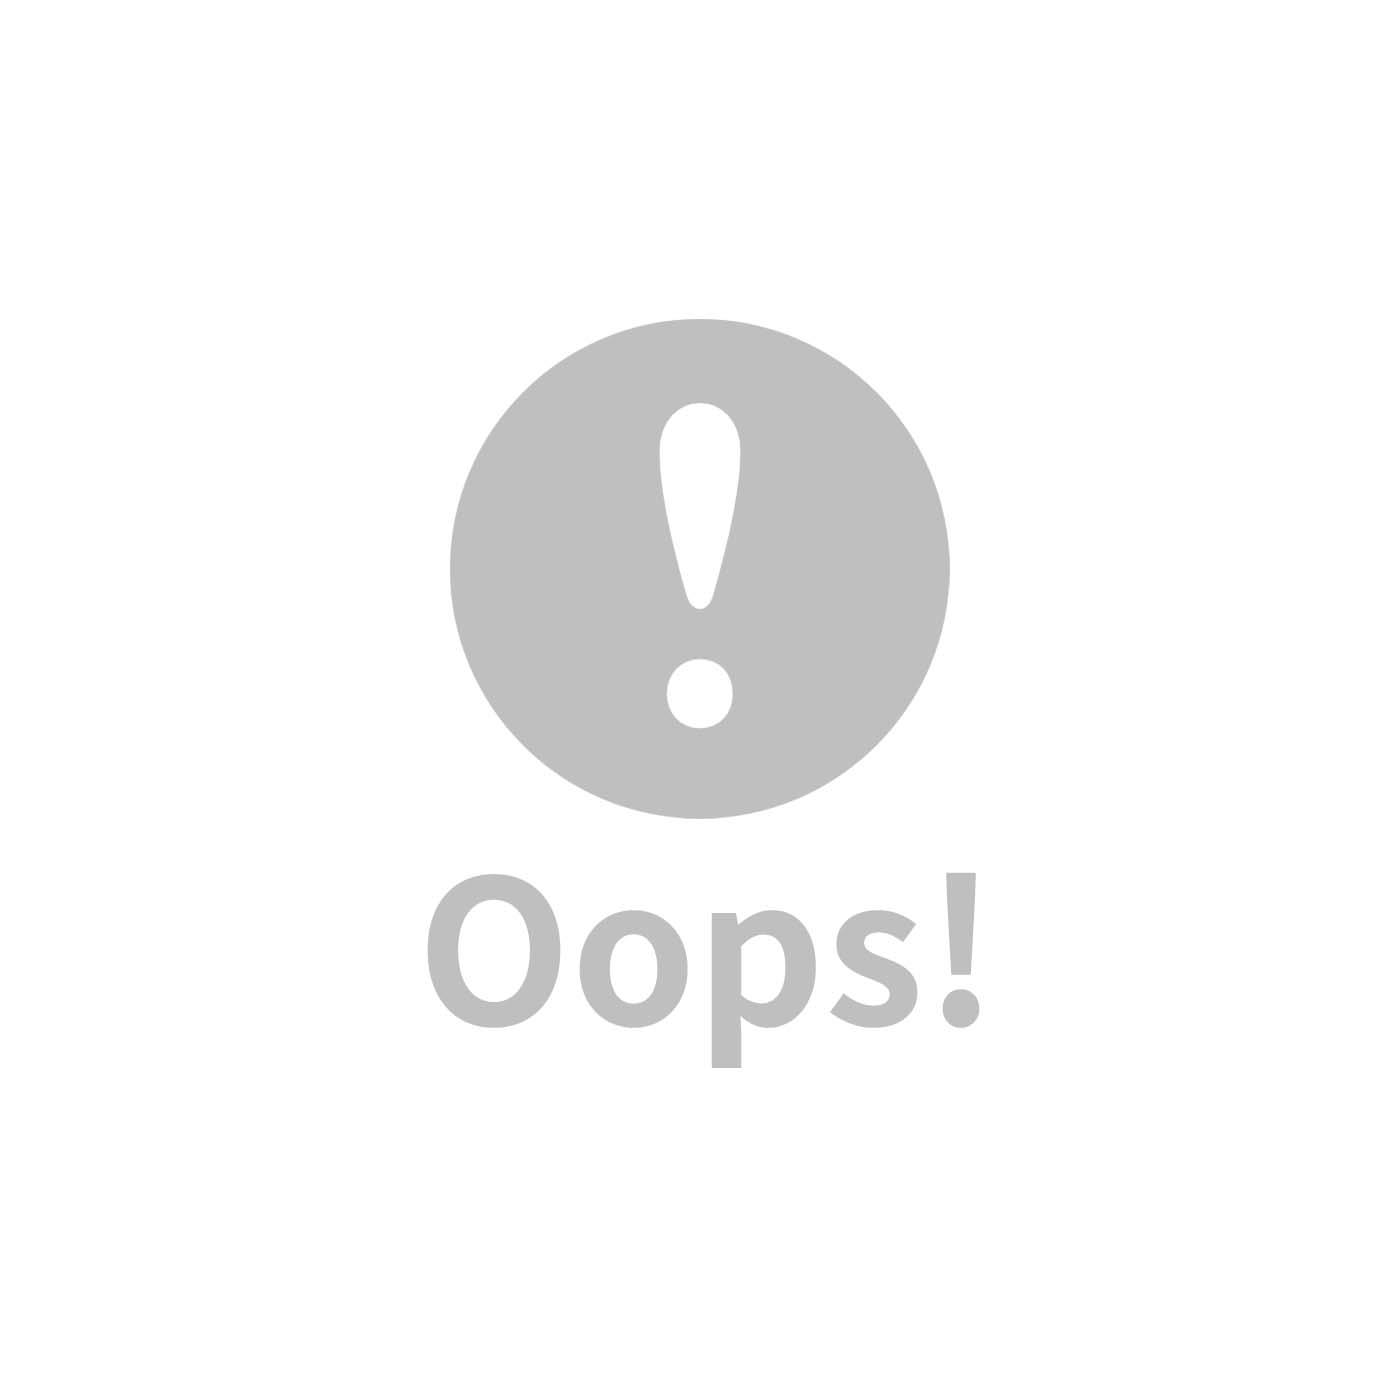 air cossi 超透氣抗菌天絲坐墊_嬰兒推車枕頭 (新生兒全身包覆款0-4m)(輕盈粉)